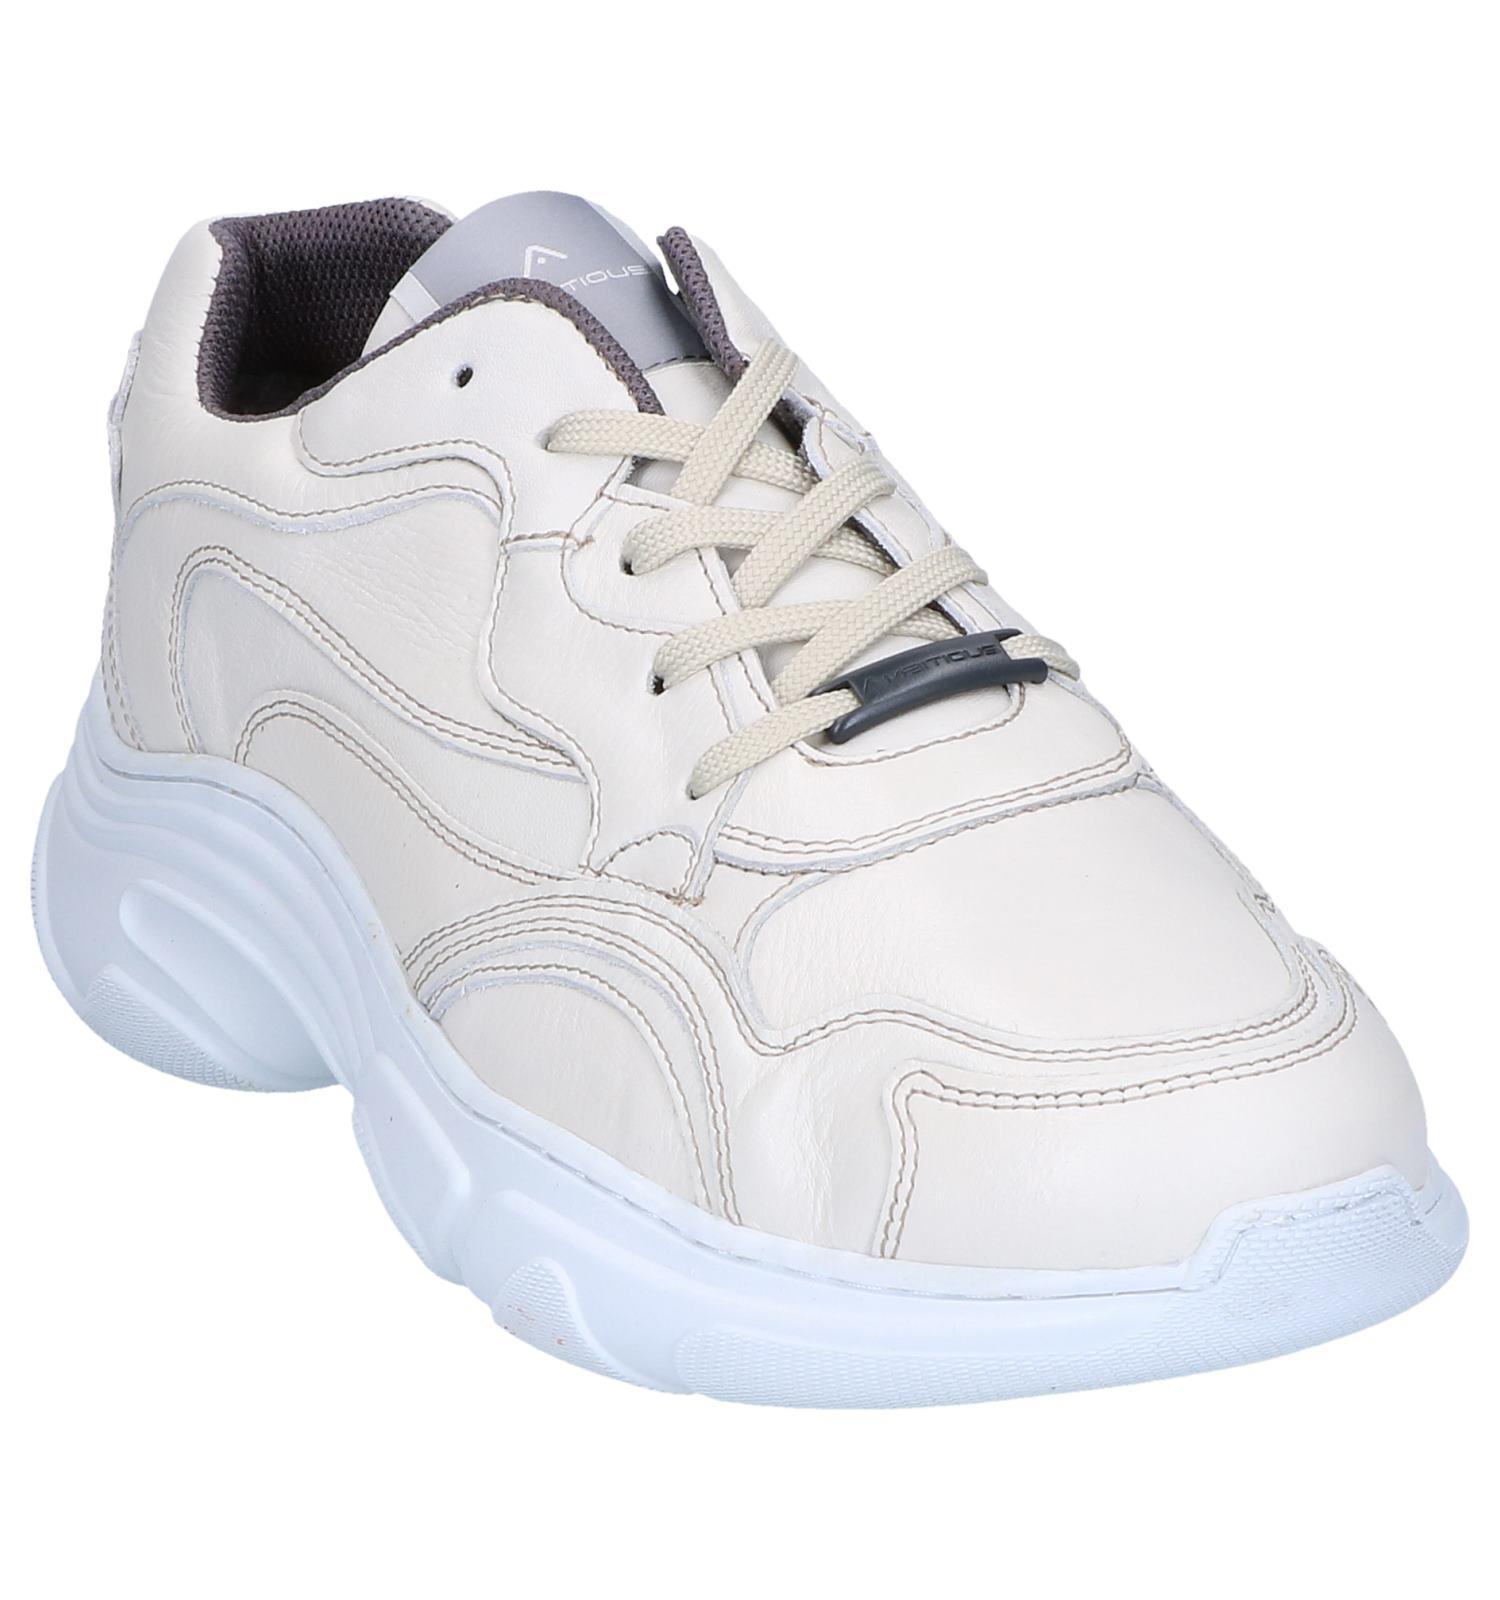 Ecru Sneakers Ecru Sneakers Ecru Ecru Ambitious Ecru Ambitious Ambitious Sneakers Sneakers Ambitious Sneakers 8O0XnPkw